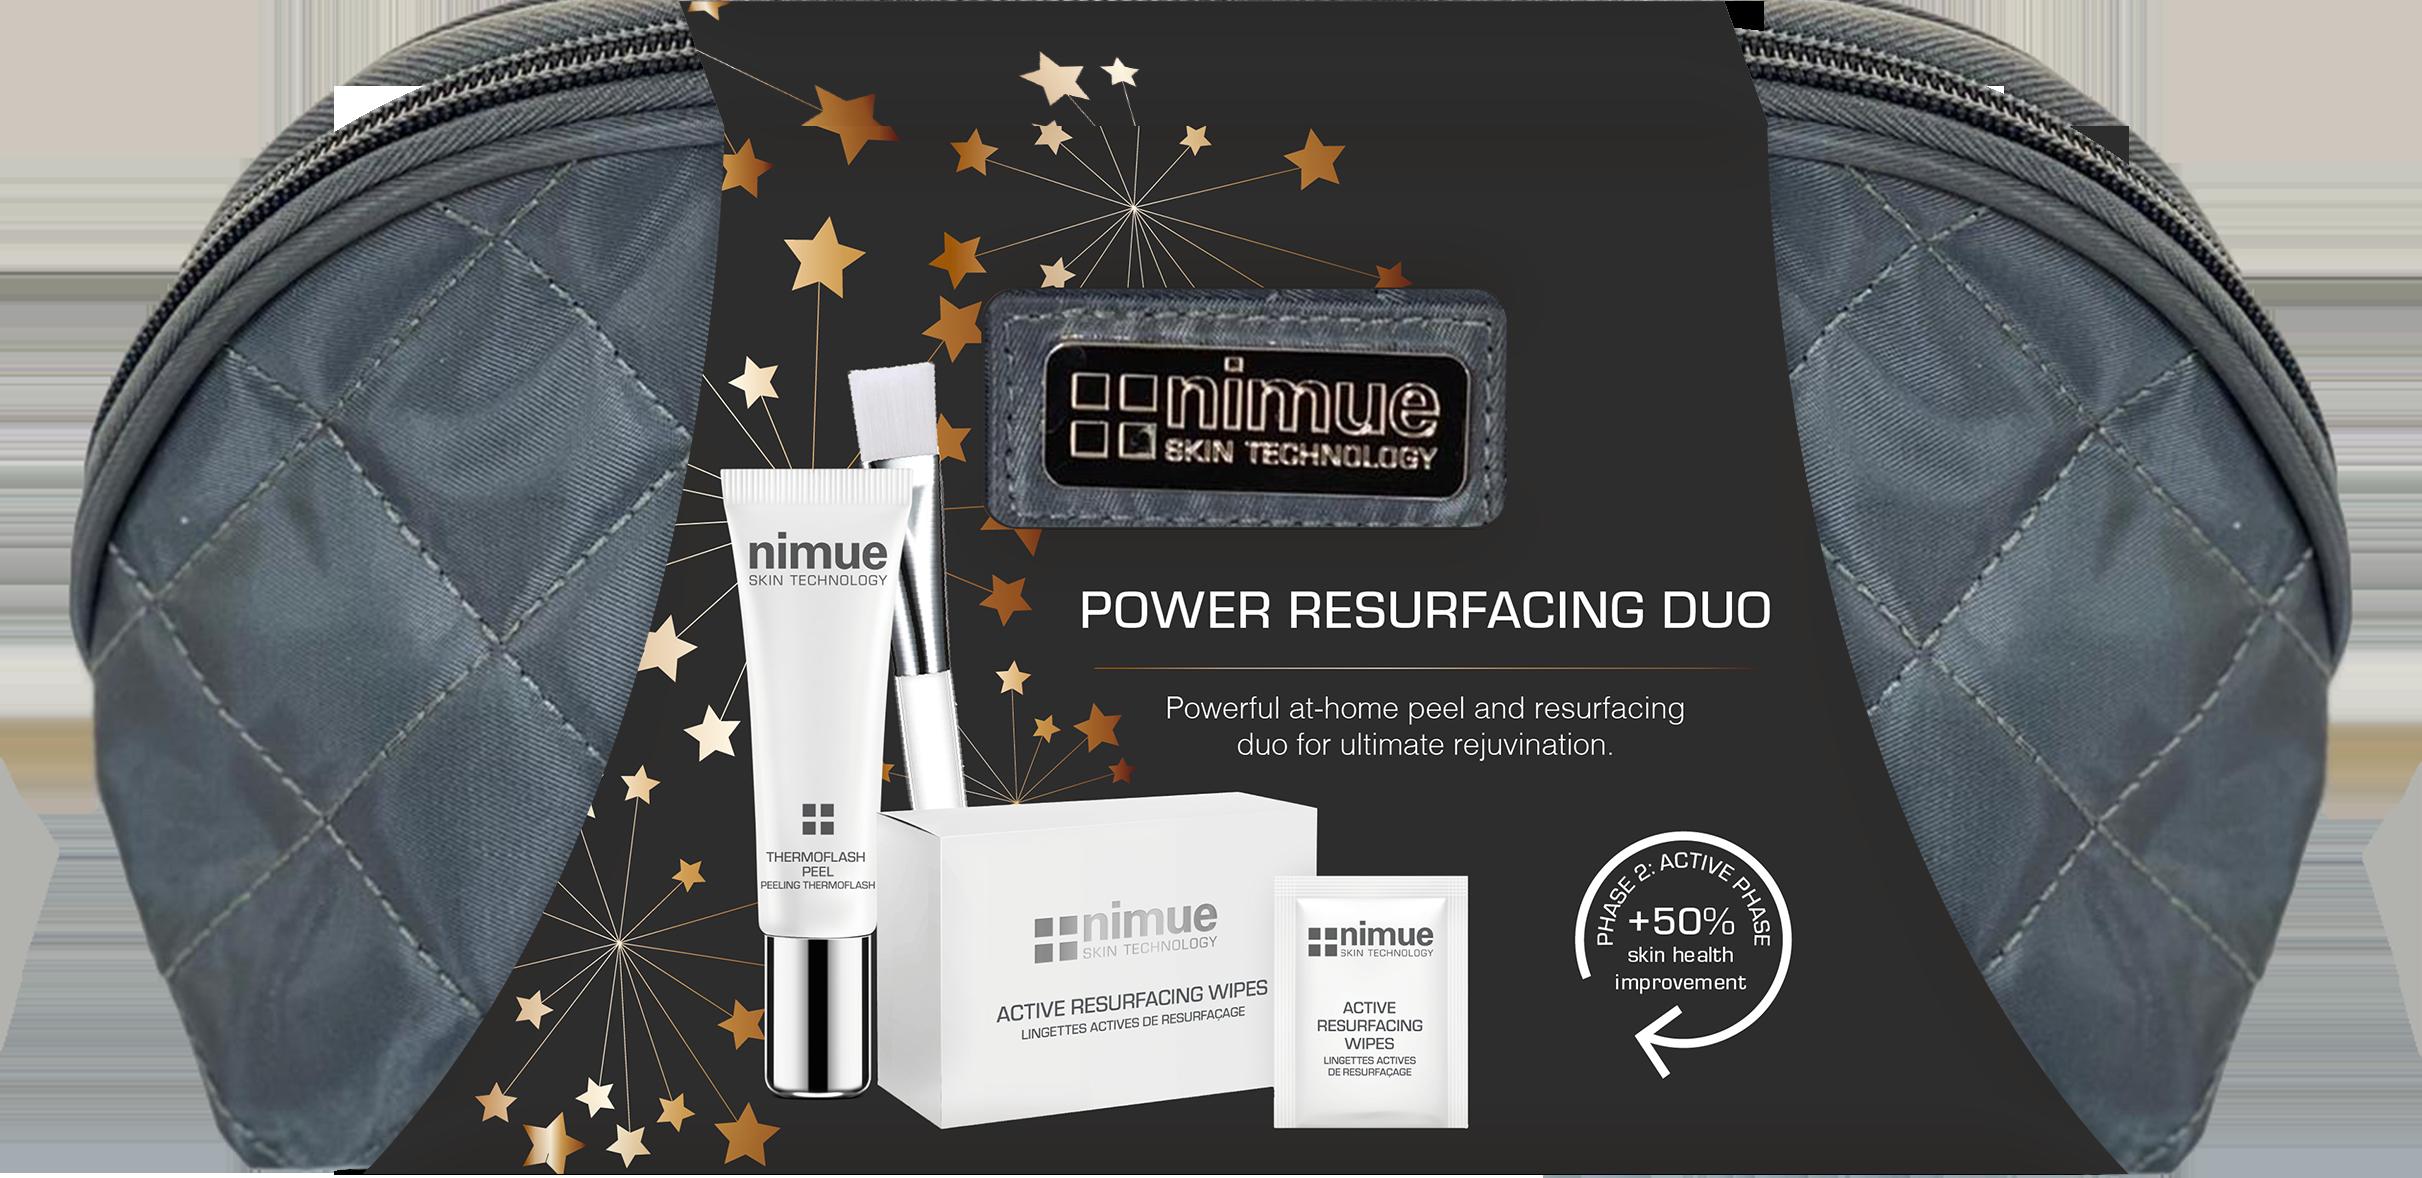 Nimue Power Resurfacing Duo